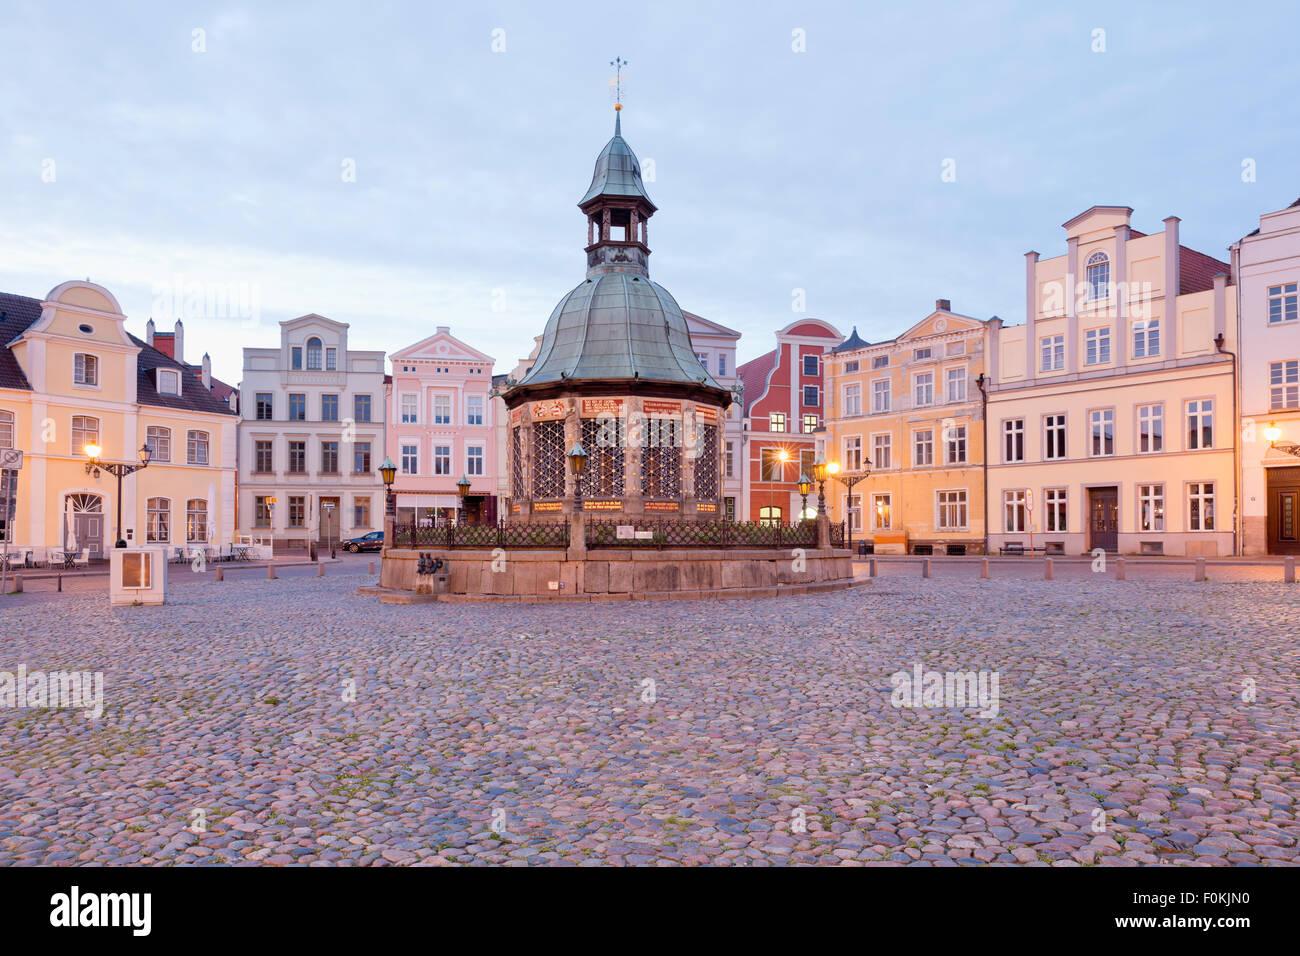 Germany, Wismar, market square with Wasserkunst at twilight - Stock Image